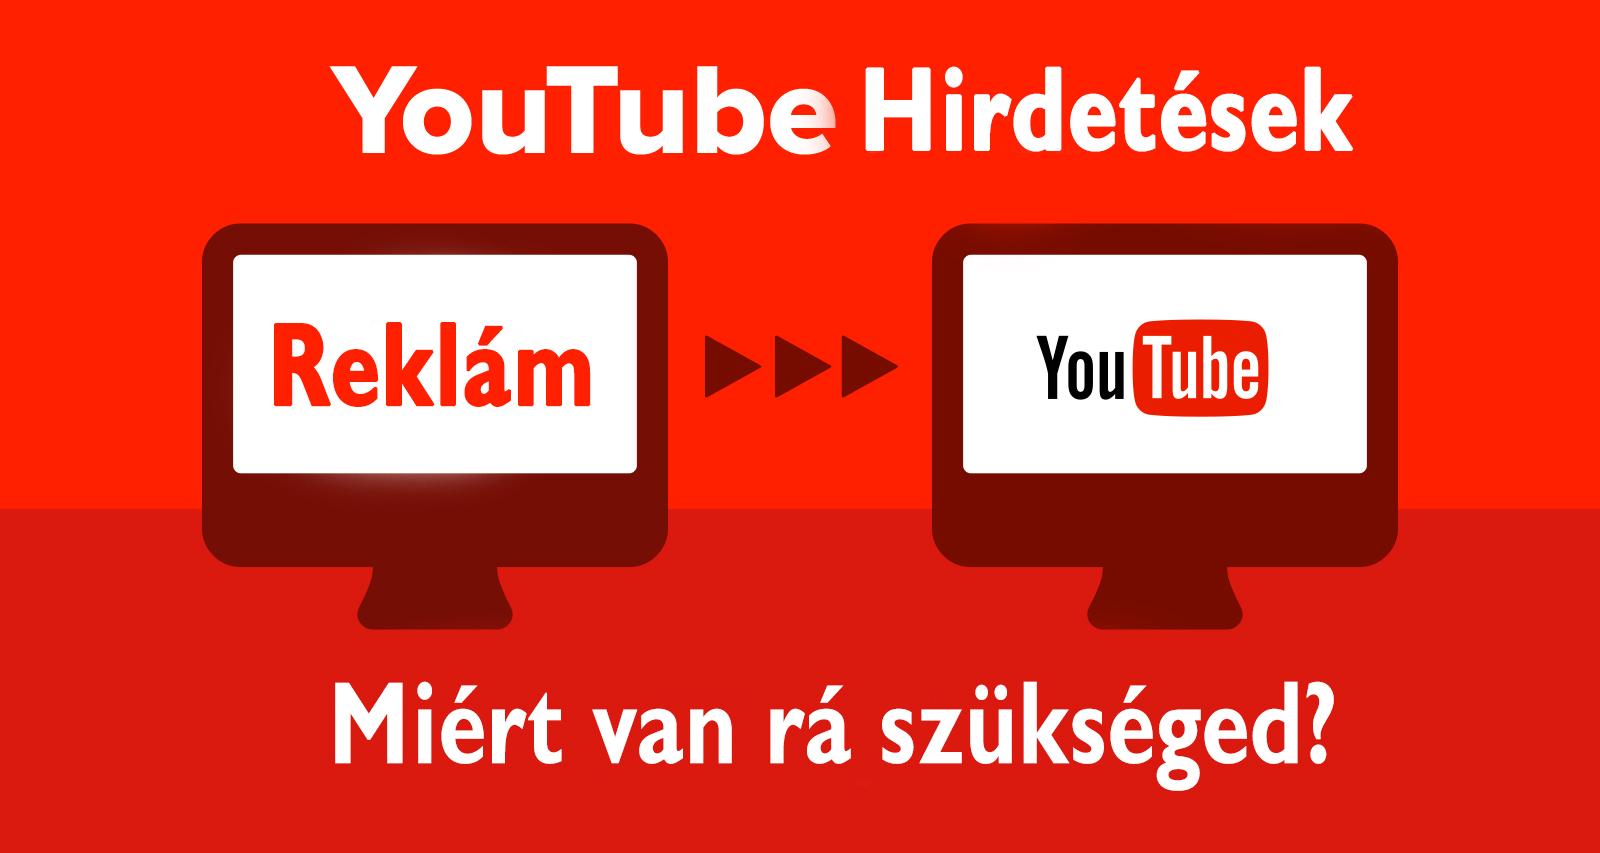 youtube-hirdetes